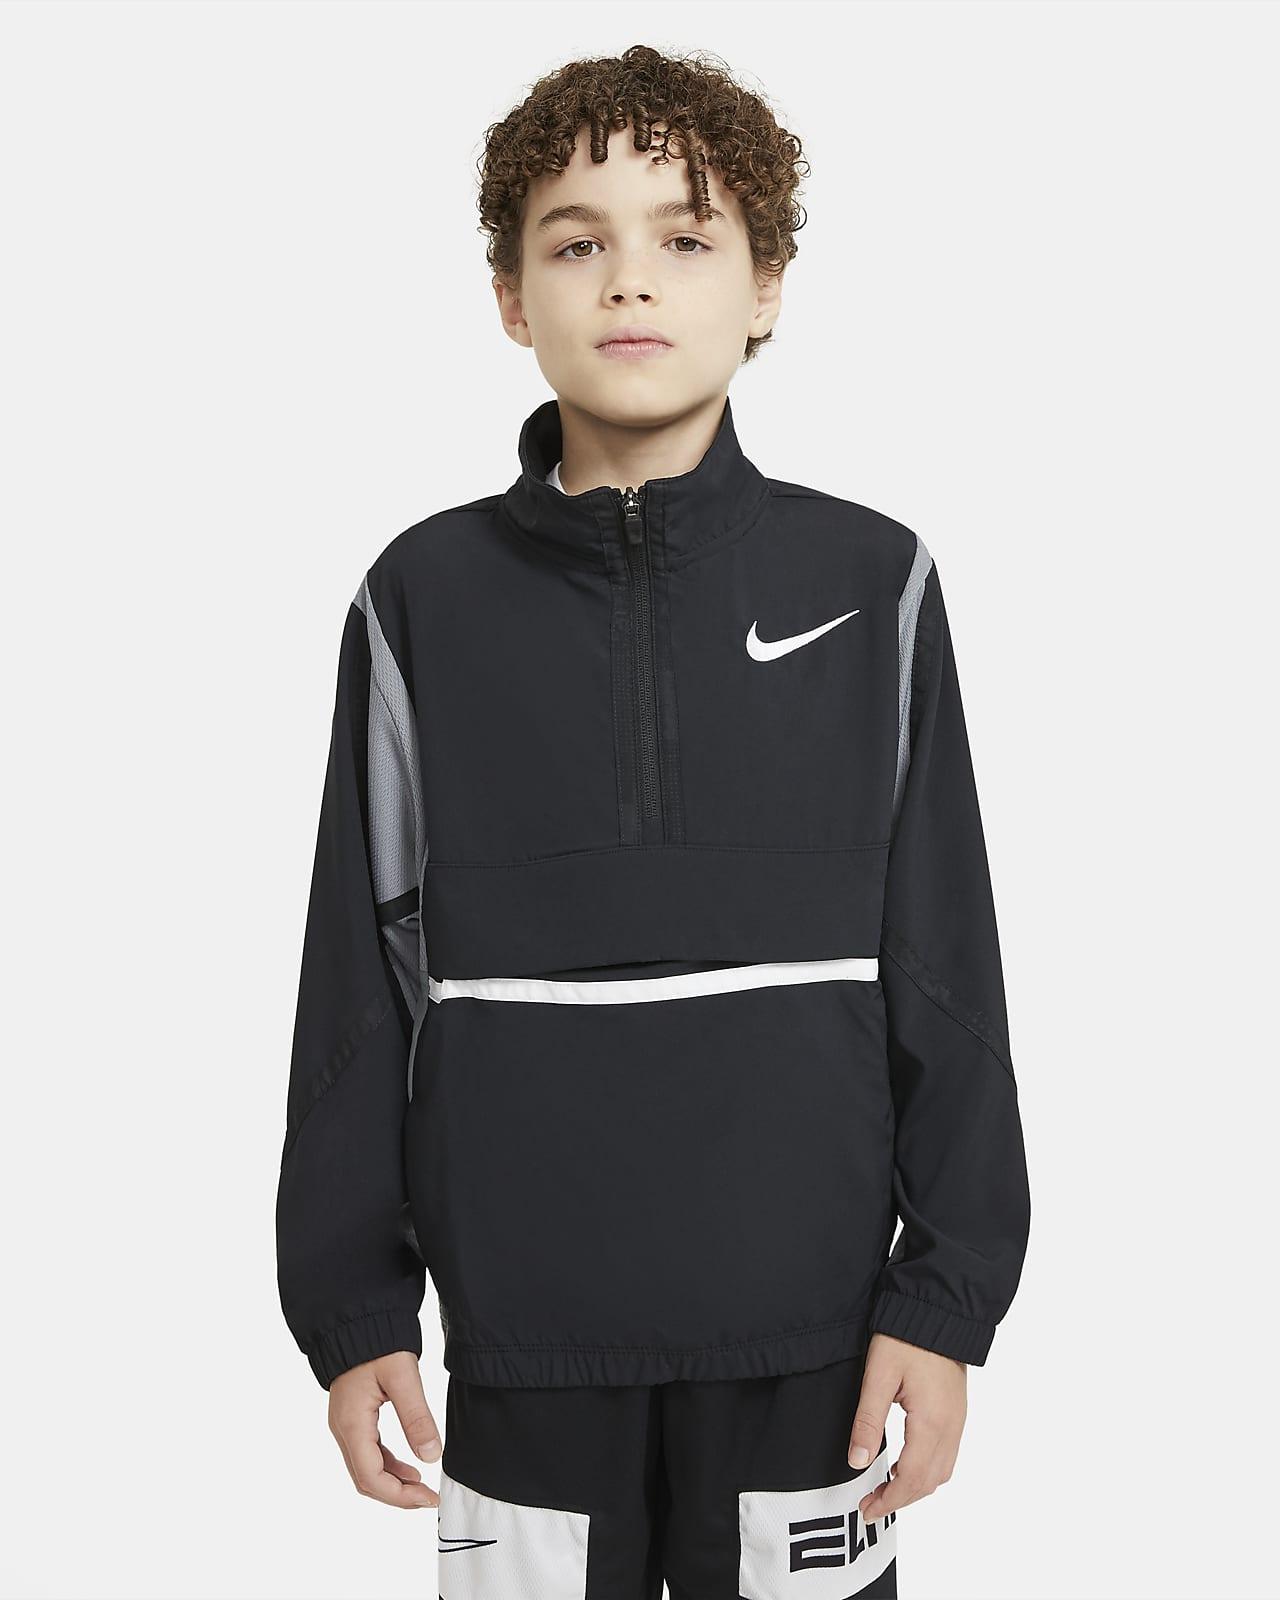 Veste de basketball Nike Crossover pour Garçon plus âgé